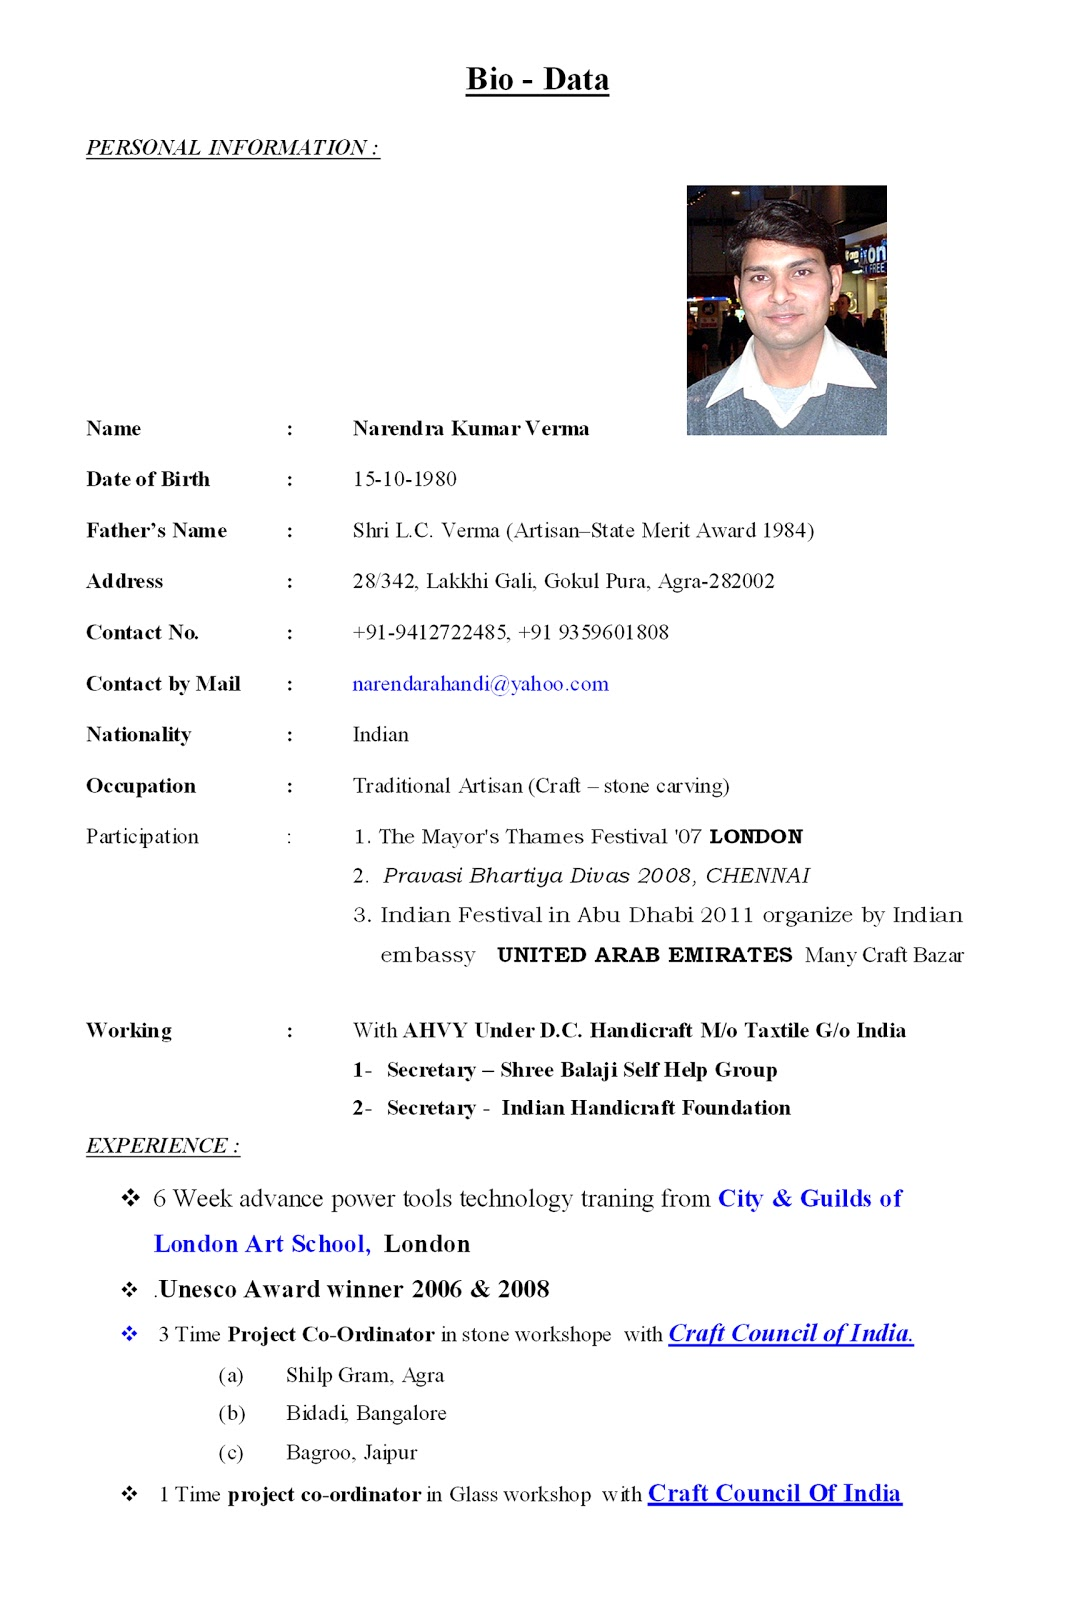 biodata template doc tk biodata template